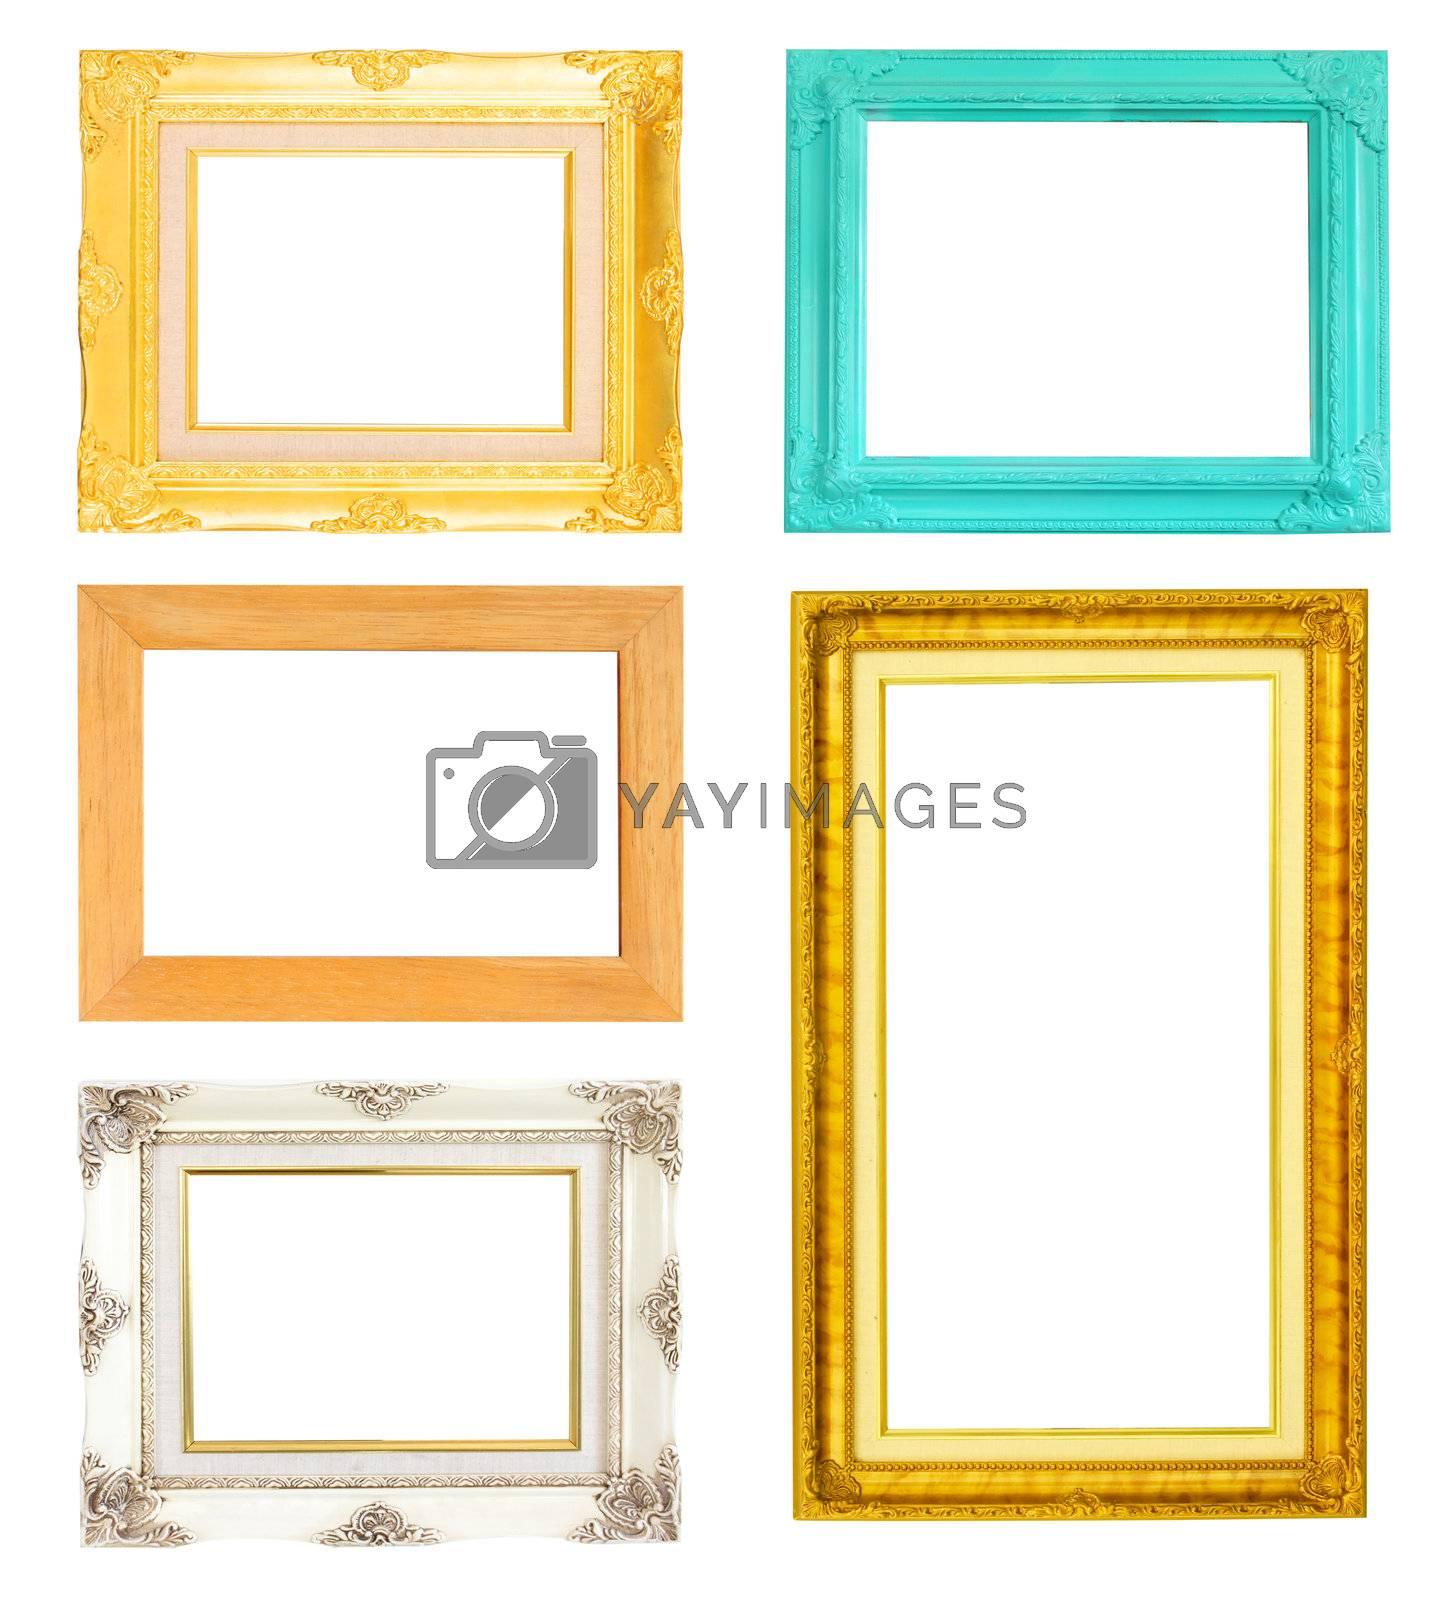 vintage frames set isolated on white background